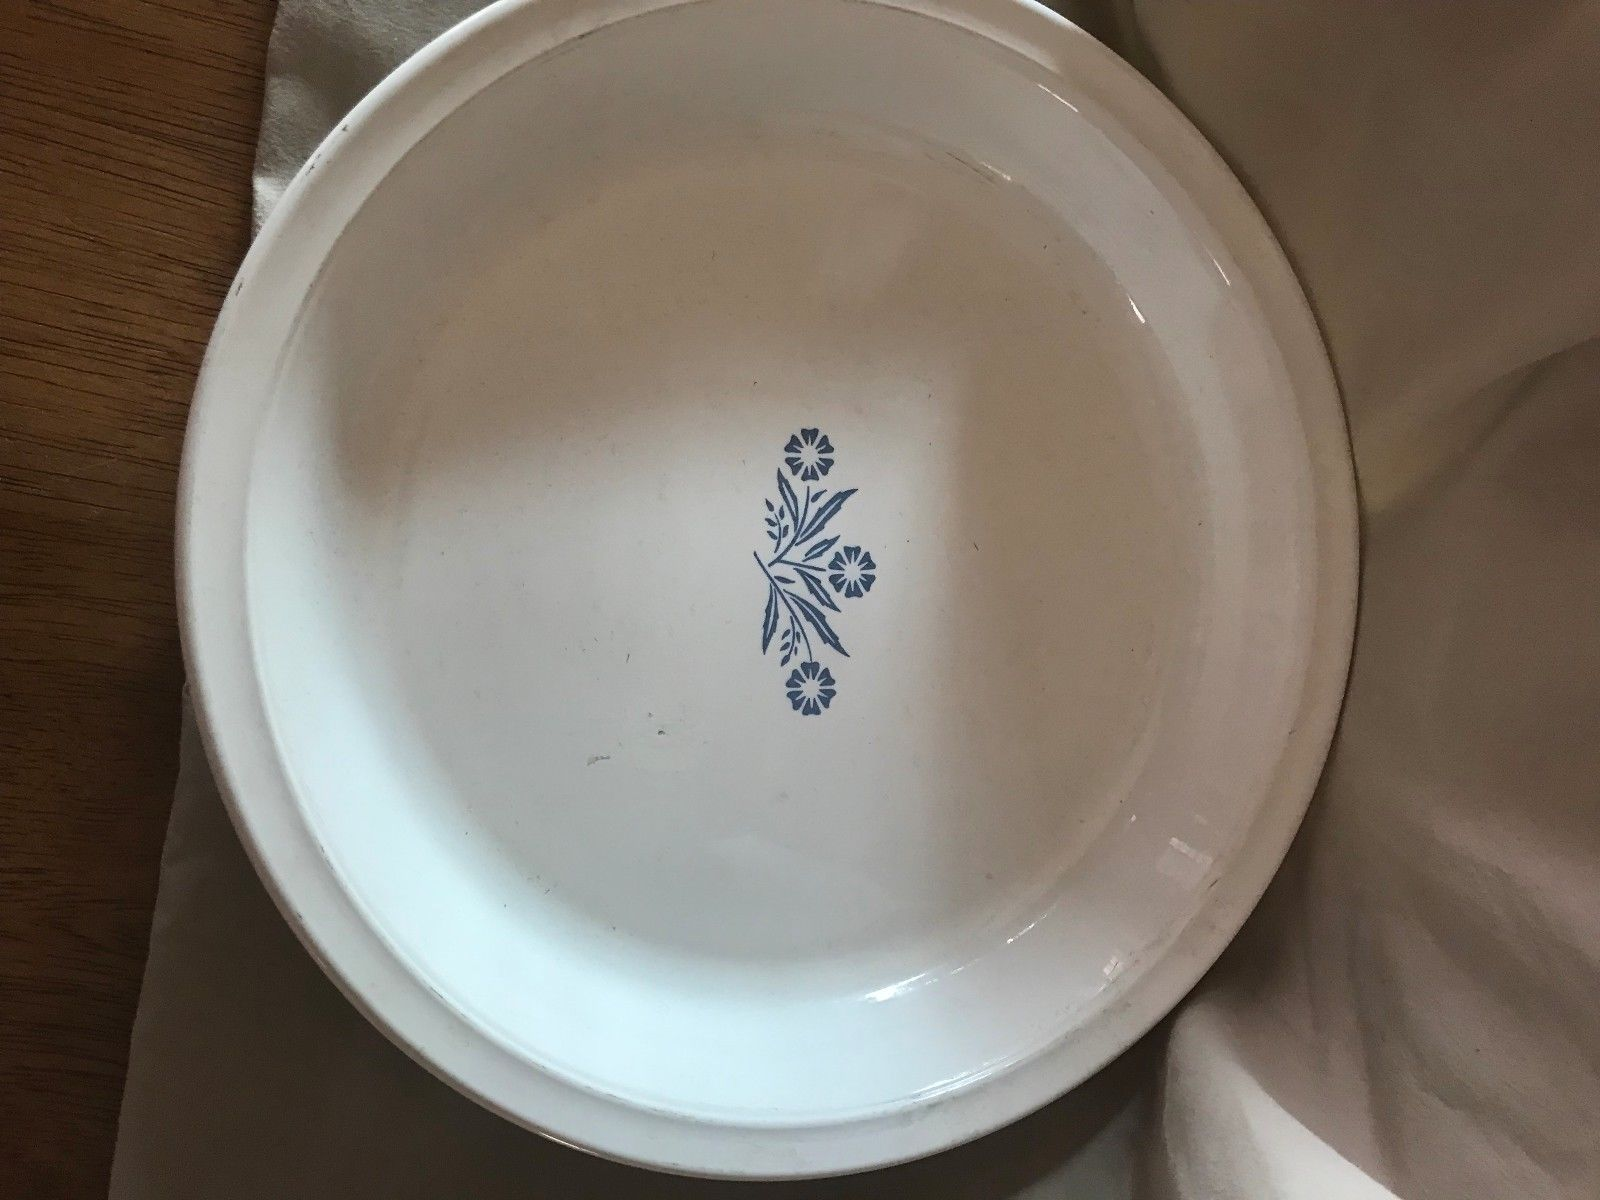 Corning Ware Blue Cornflower Pie Pan P 309 9 Inch Round Baking Dish Made In Usa